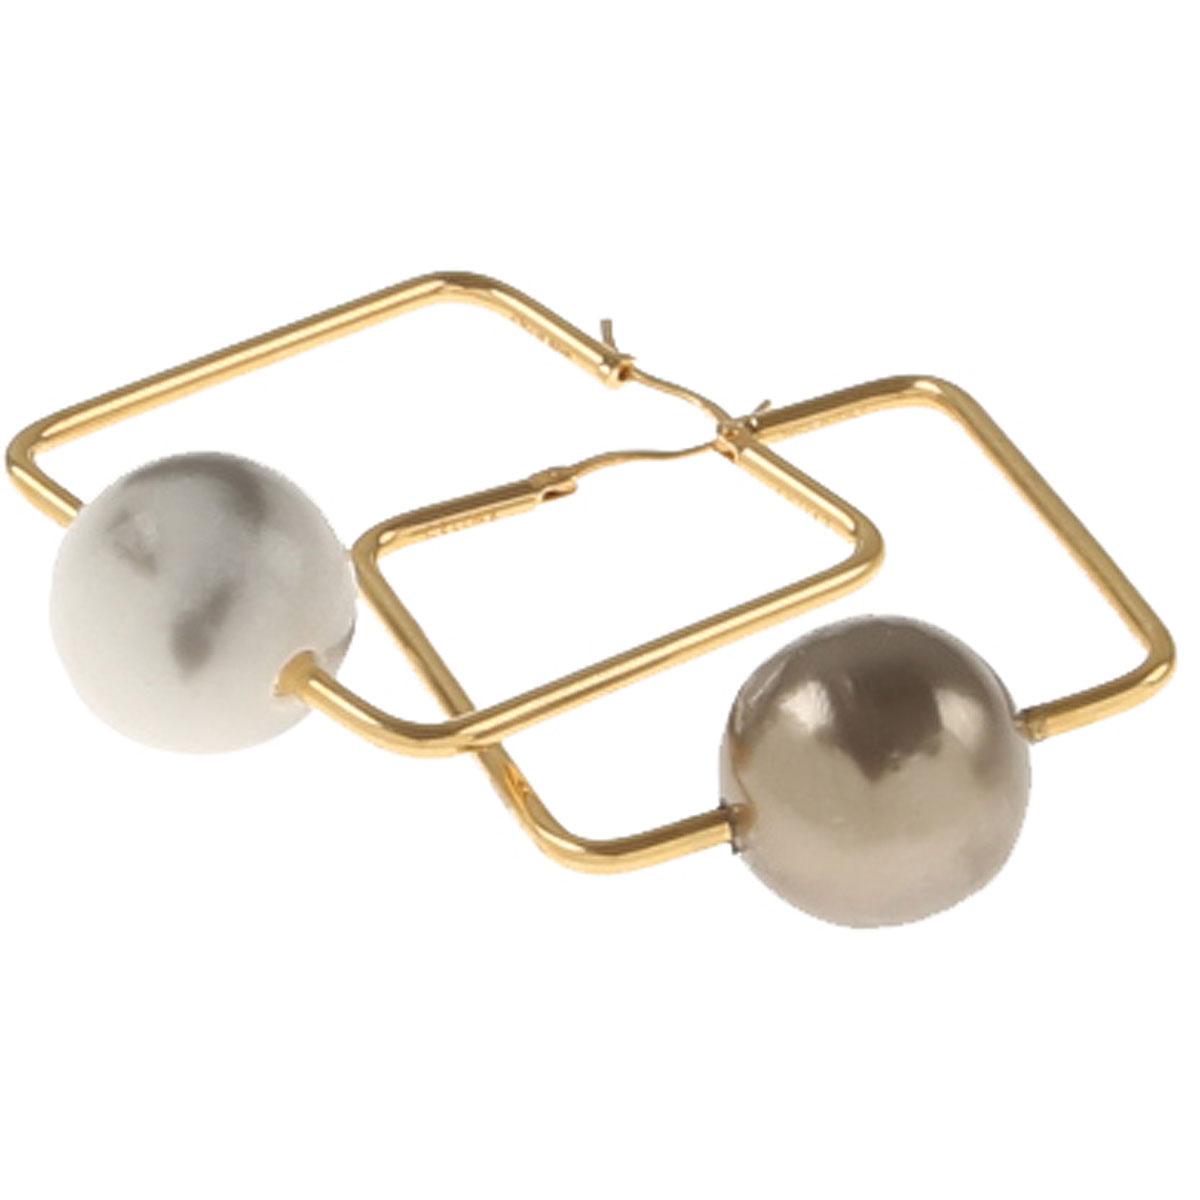 Image of Celine Earrings for Women, Yellow Gold, Brass, 2017